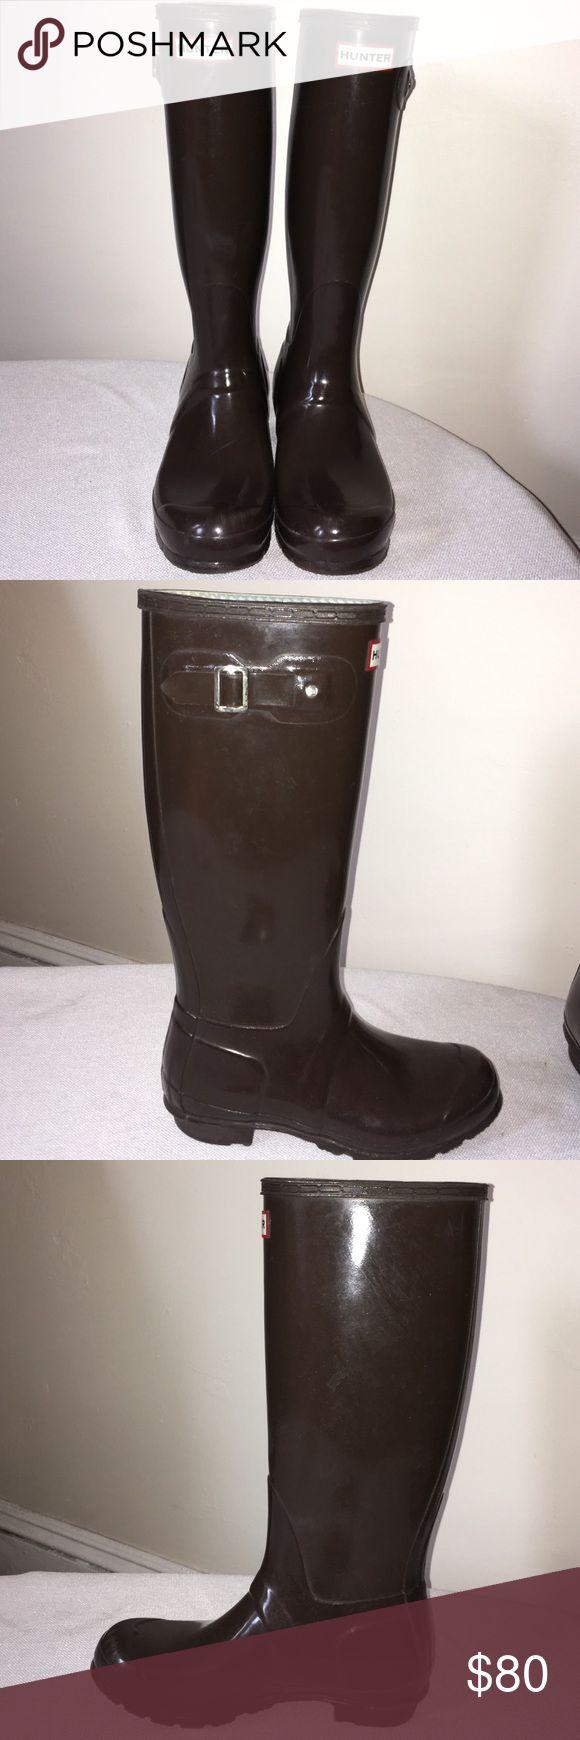 Tall Brown Hunter Rain Boots Brown original gloss tall Hunter rain boots. Hunter Boots Shoes Winter & Rain Boots